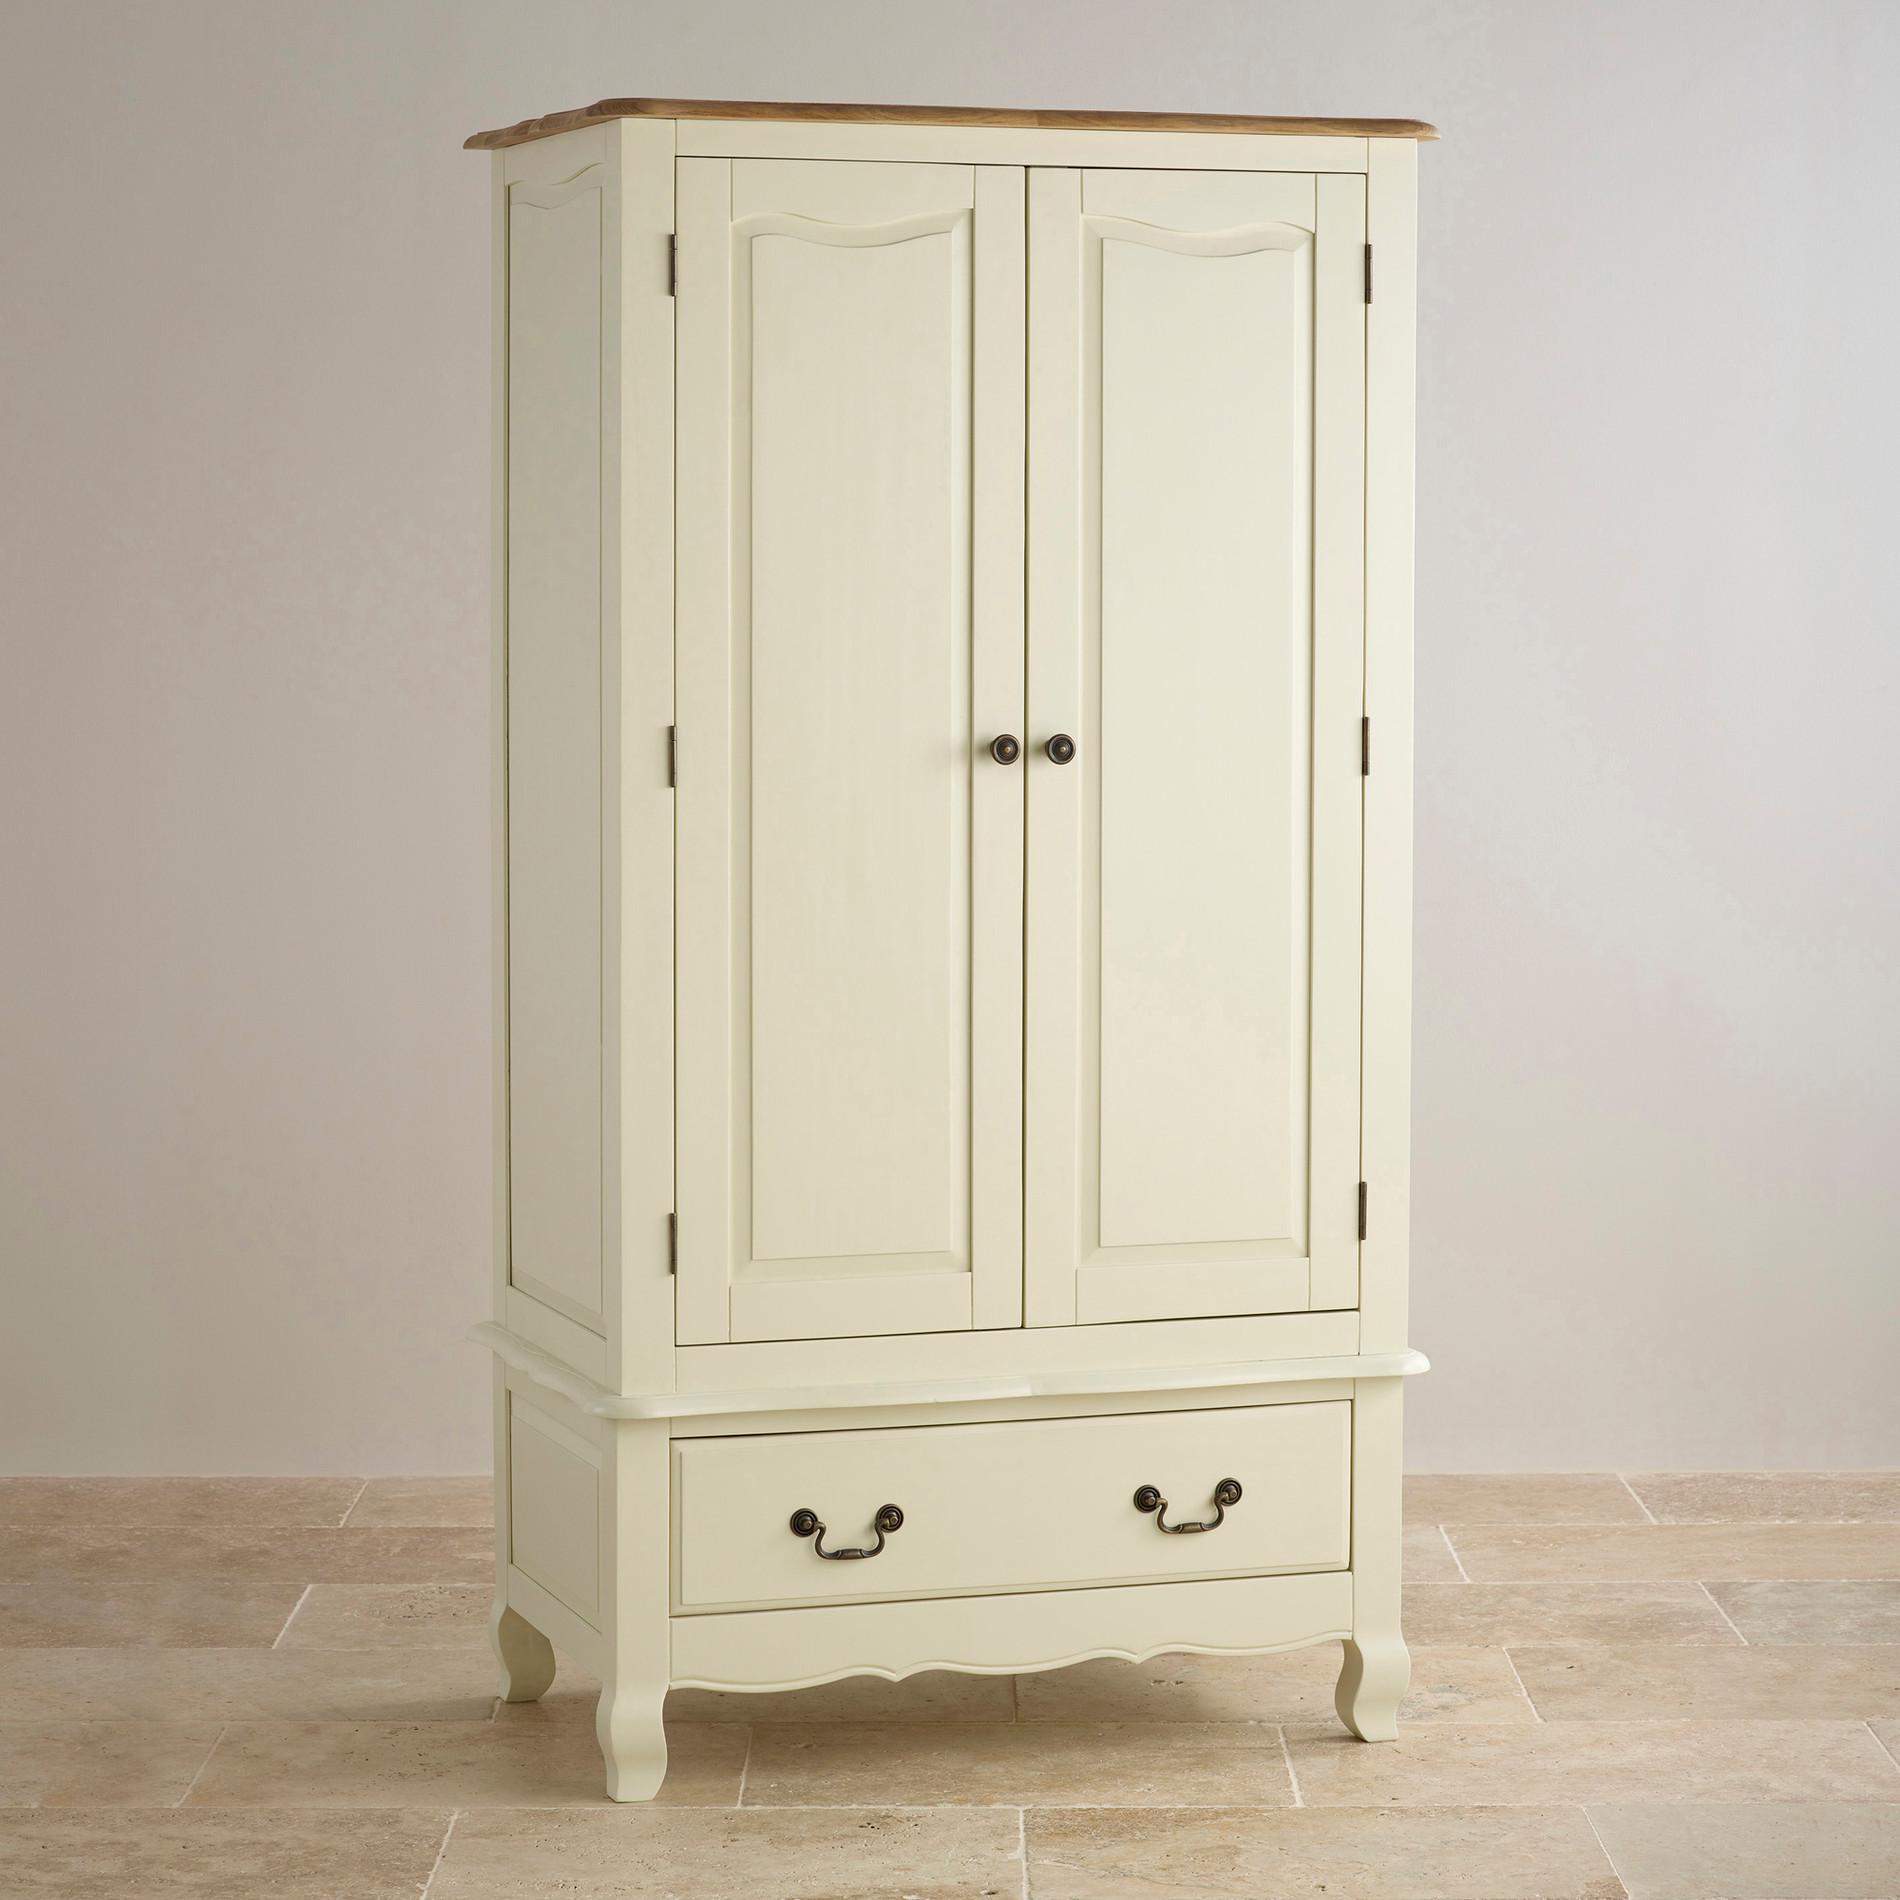 bella painted double wardrobe in solid oak oak furniture. Black Bedroom Furniture Sets. Home Design Ideas